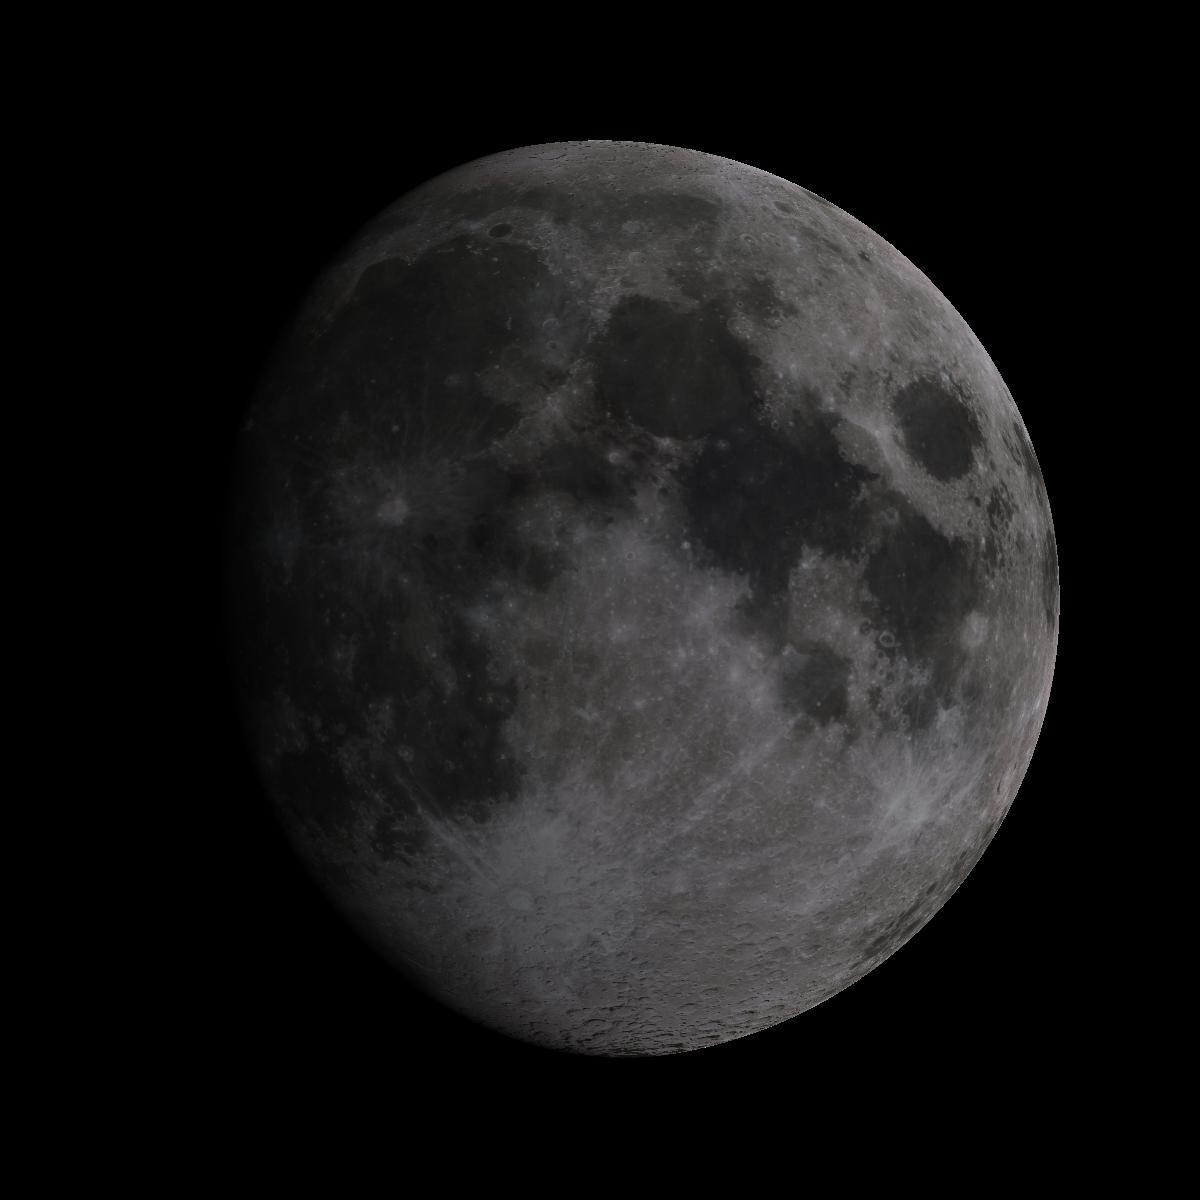 Lune du 14 juillet 2019